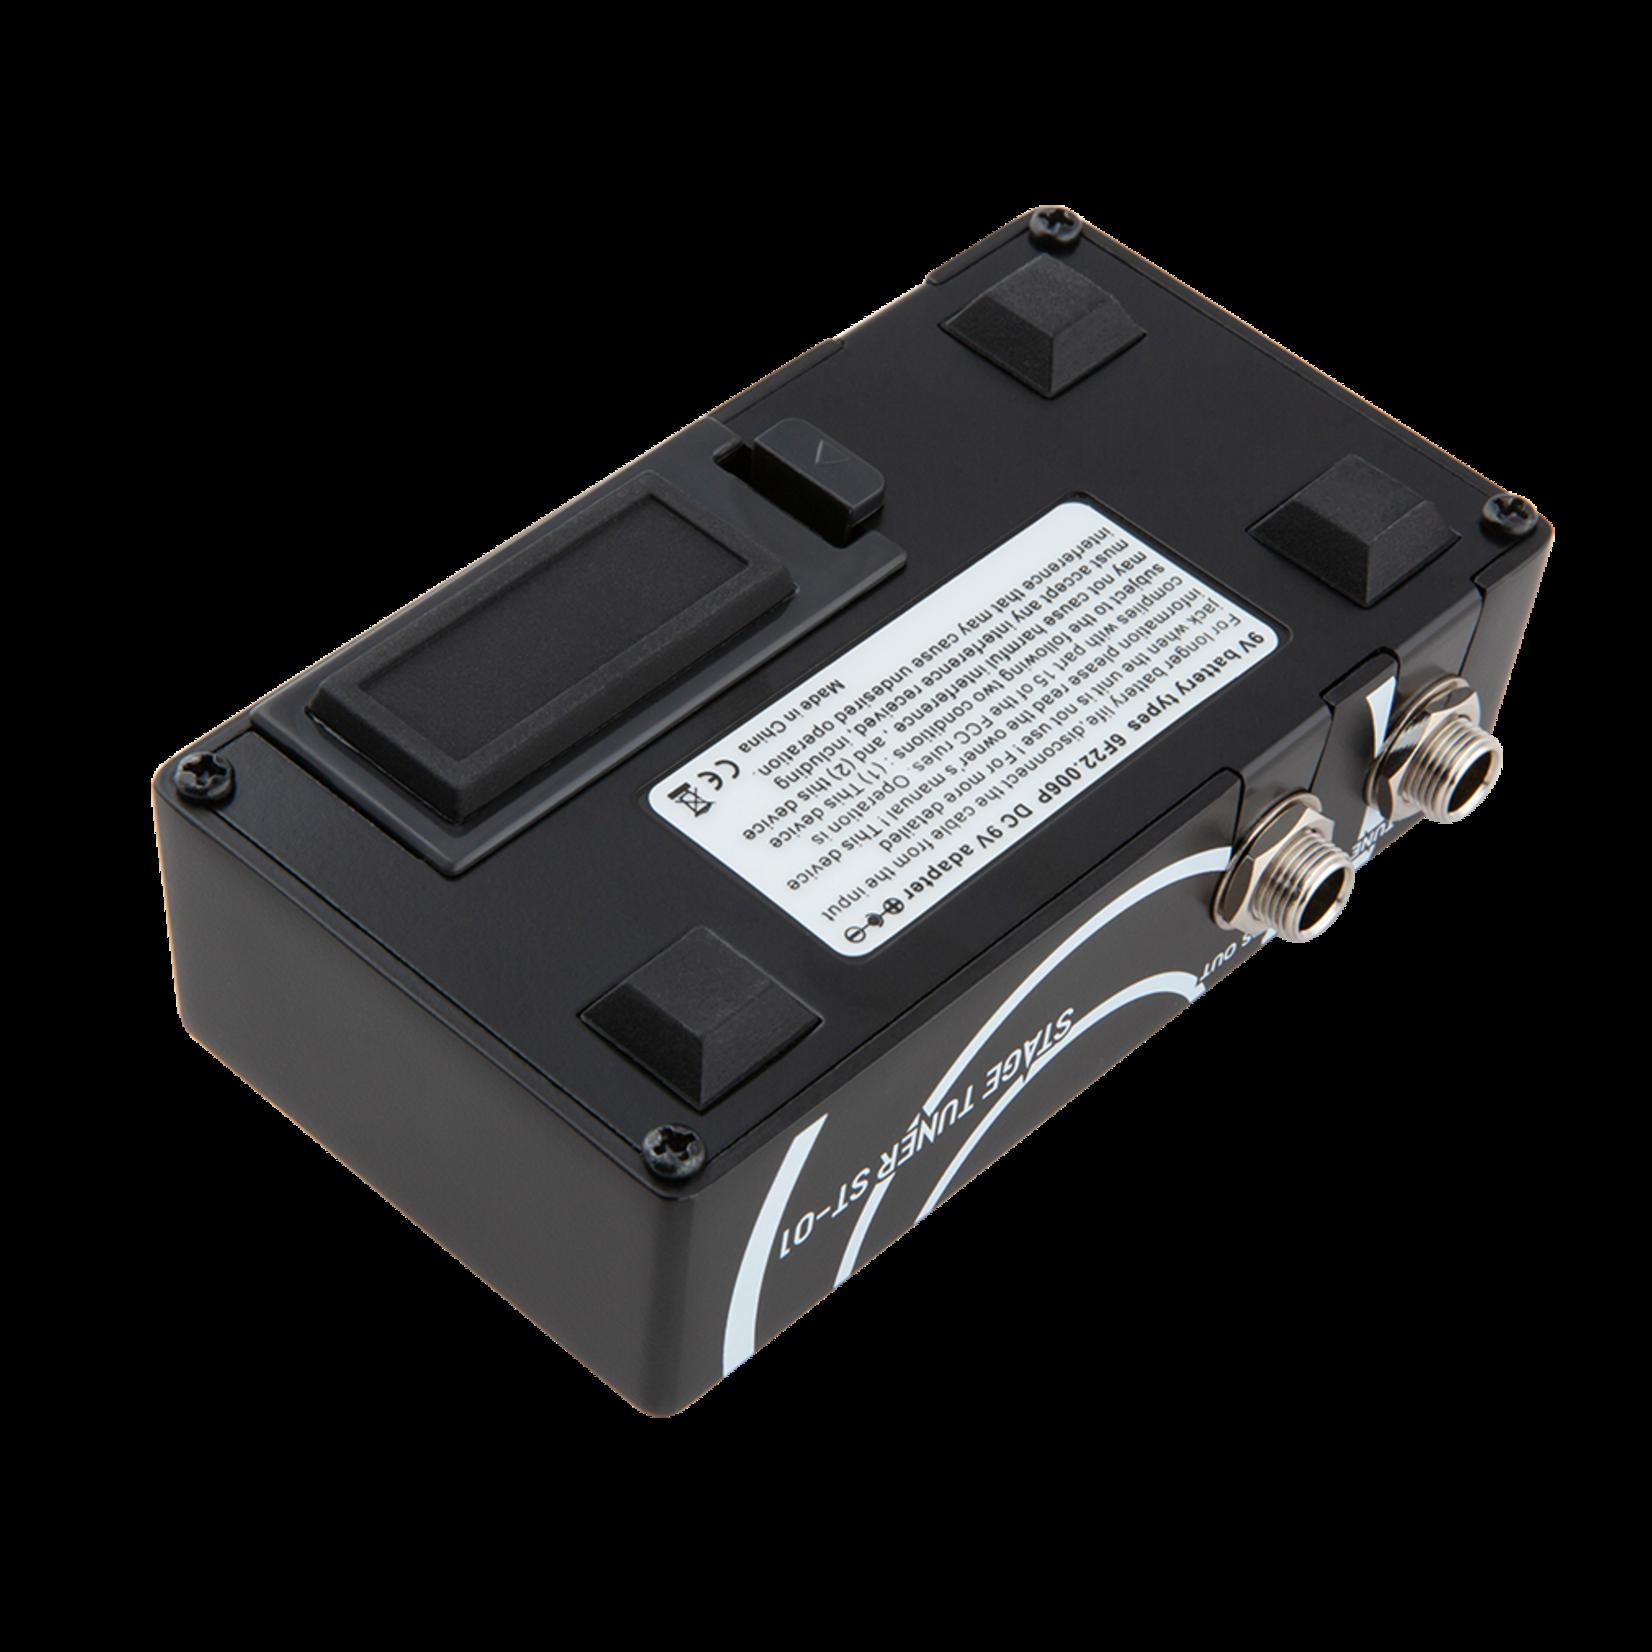 Rockboard RockBoard  StageTuner ST-01 Chromatic Pedal Tuner